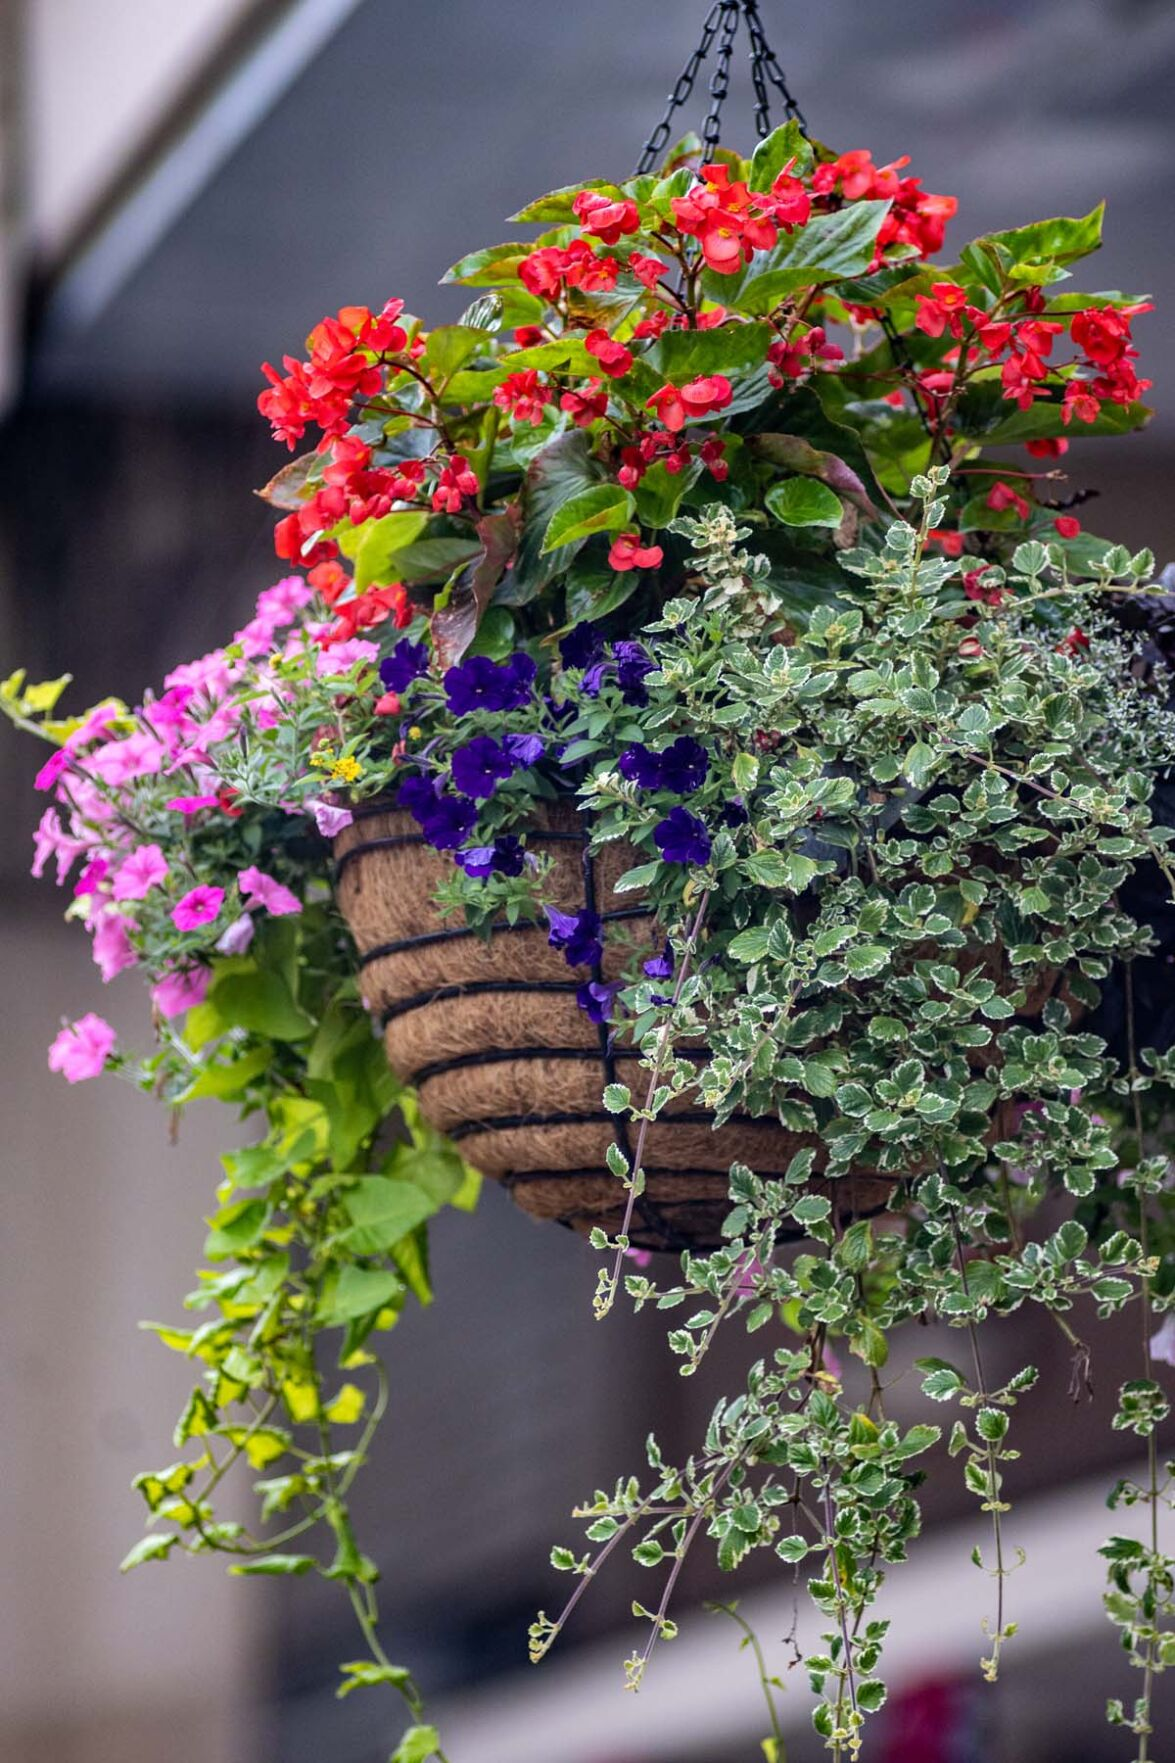 In Bloom: Hanging baskets flowering downtown